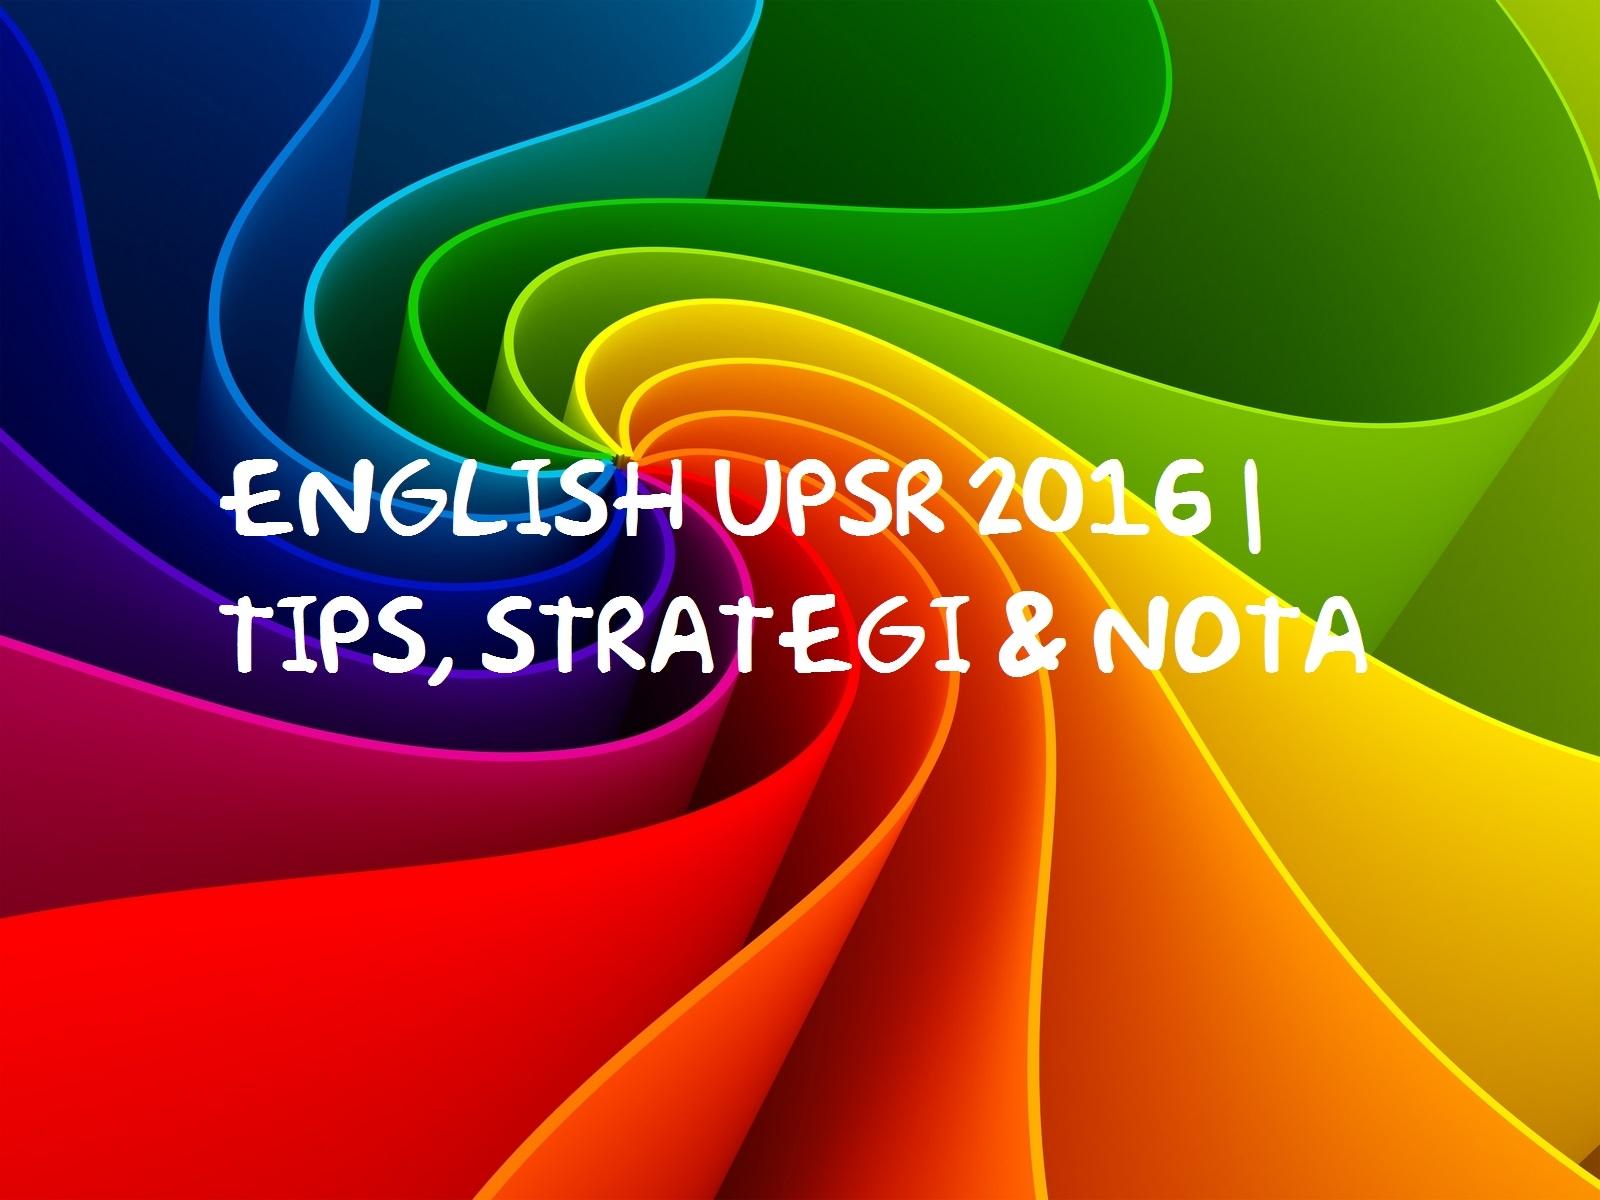 Nota Padat Bahasa Melayu Upsr Yang Sangat Baik English Upsr 2016 Tips Strategi Nota Cemerlang Bahasa Inggeris Of Muat Turun Nota Padat Bahasa Melayu Upsr Yang Menarik Untuk Para Ibubapa Download